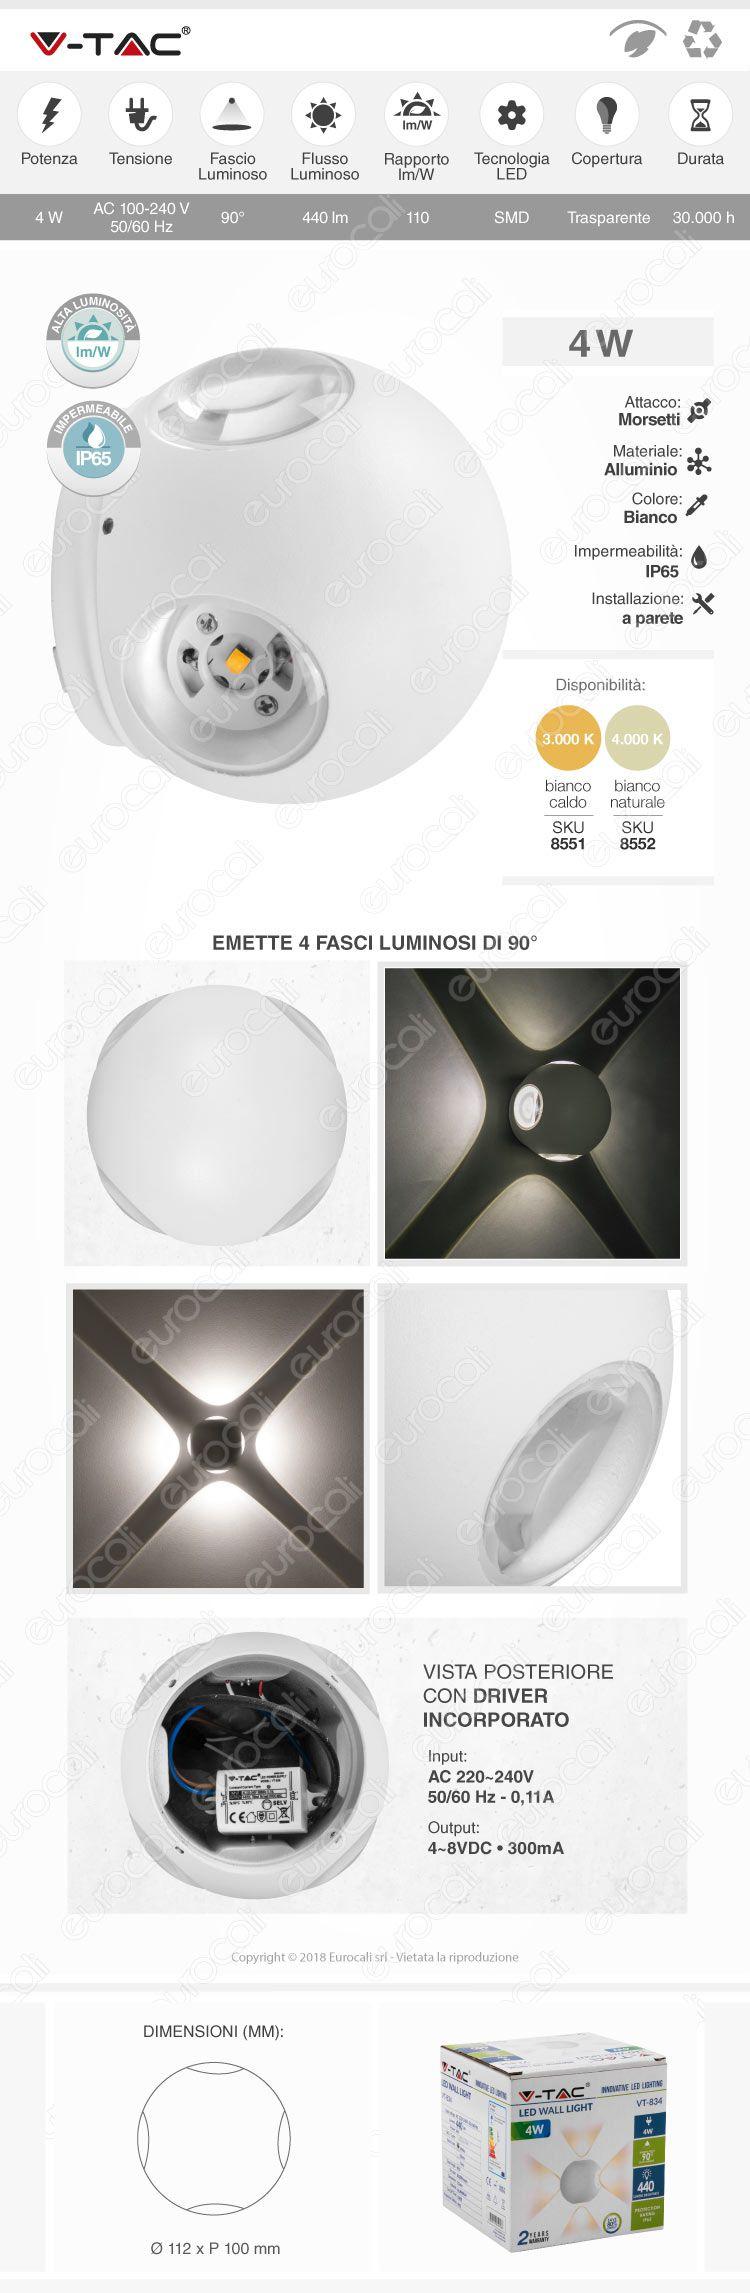 V-Tac VT-834 Lampada da Muro Wall Light LED 4W Forma Sferica Colore Bianco IP65